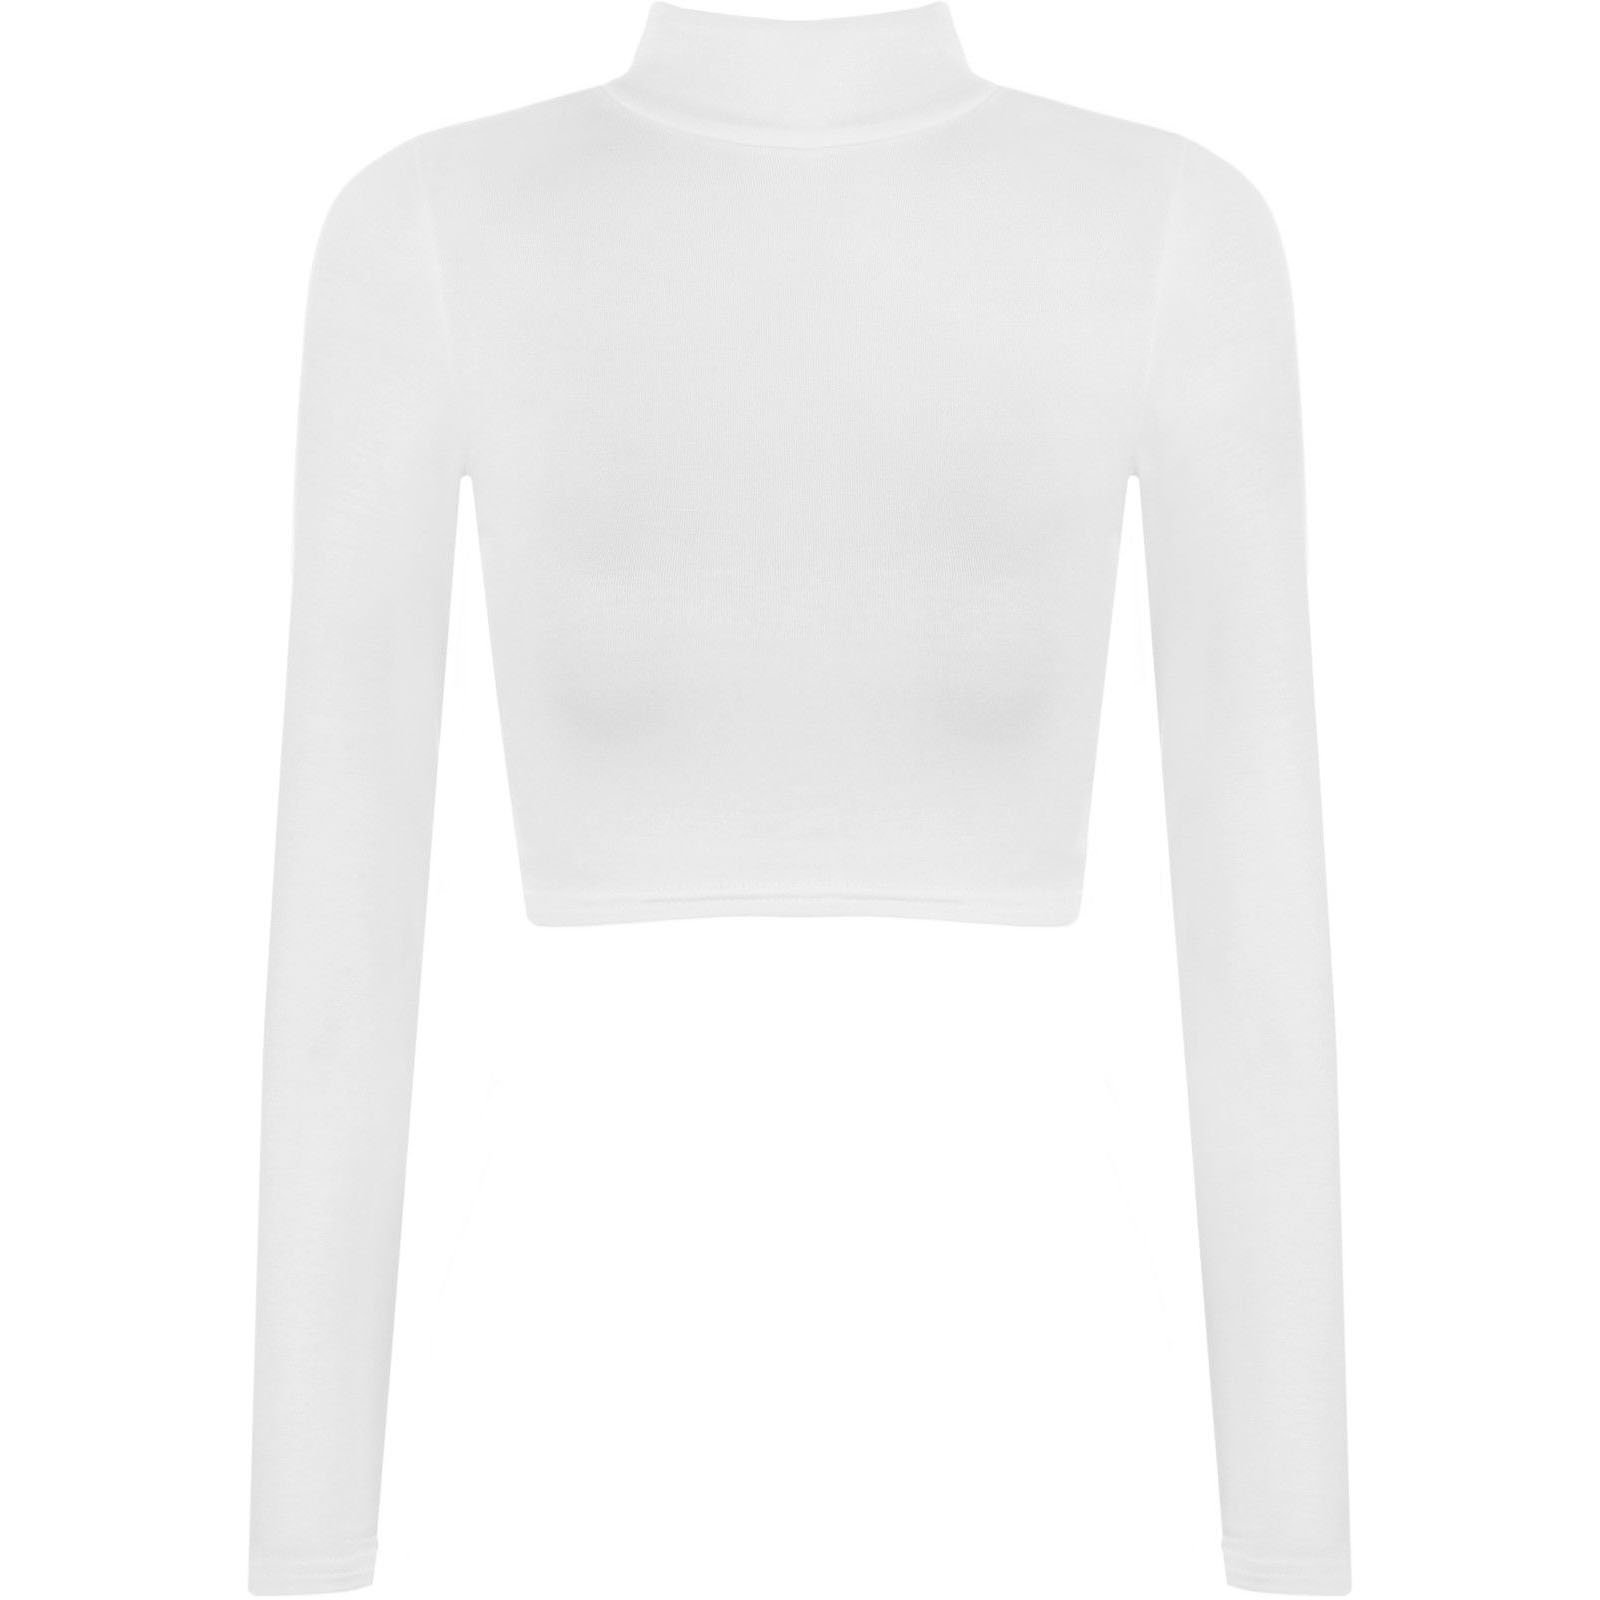 Womens Turtle Neck Crop Long Sleeve Plain Top---Thin Fabric WHITE-S/M